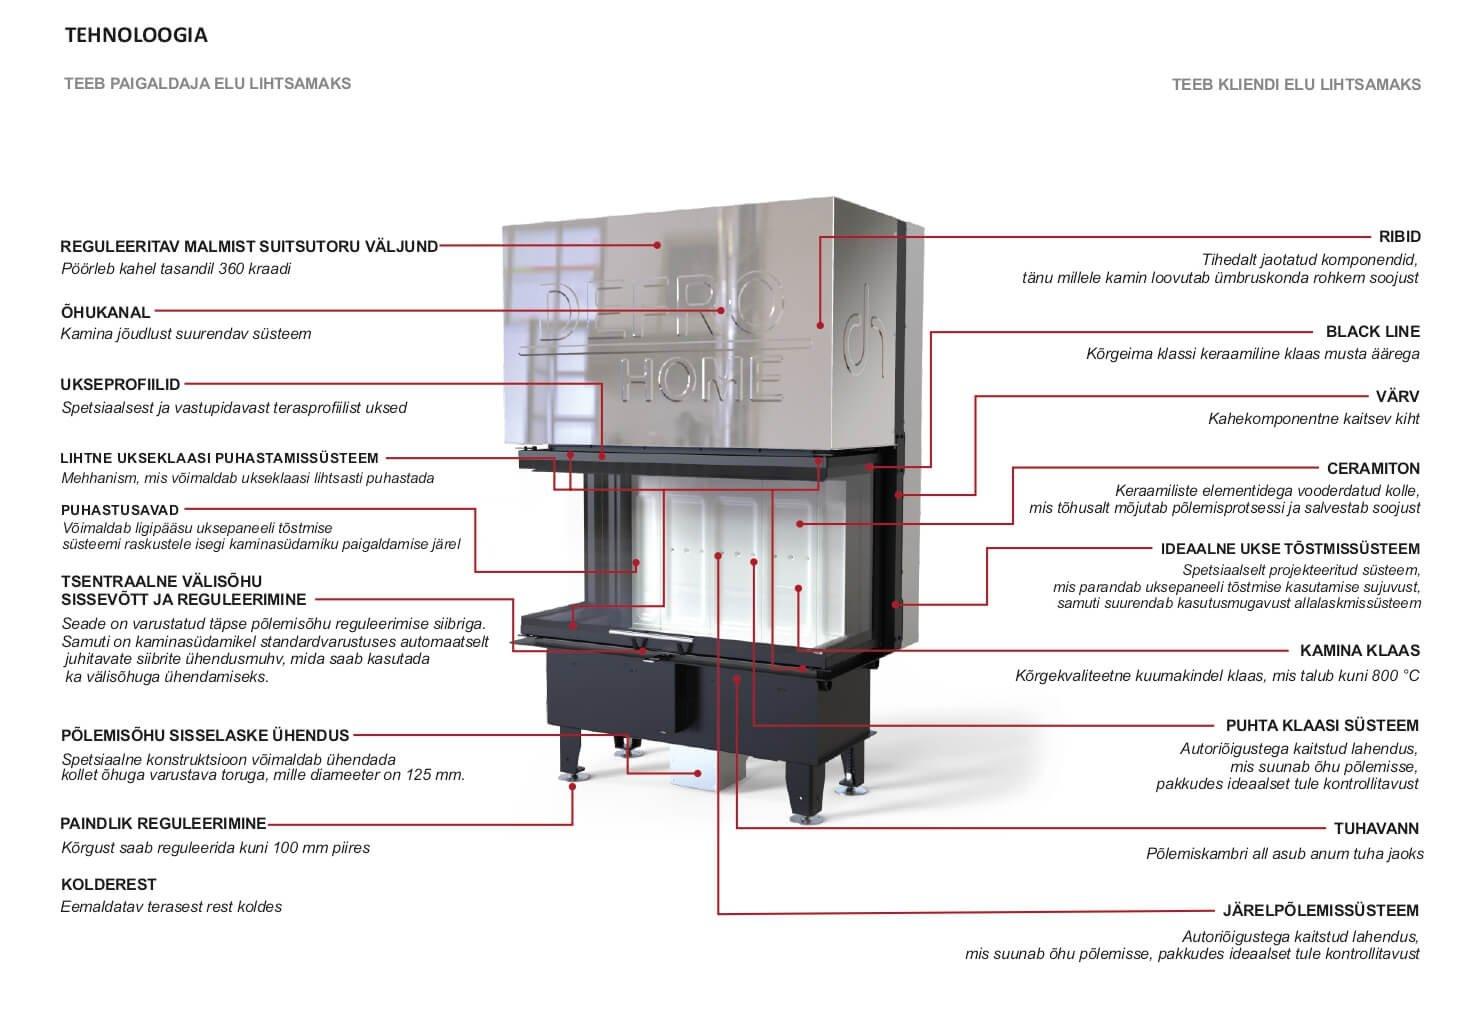 Defro Home Kaminasüdamik Intra XSM C G tehnoloogia